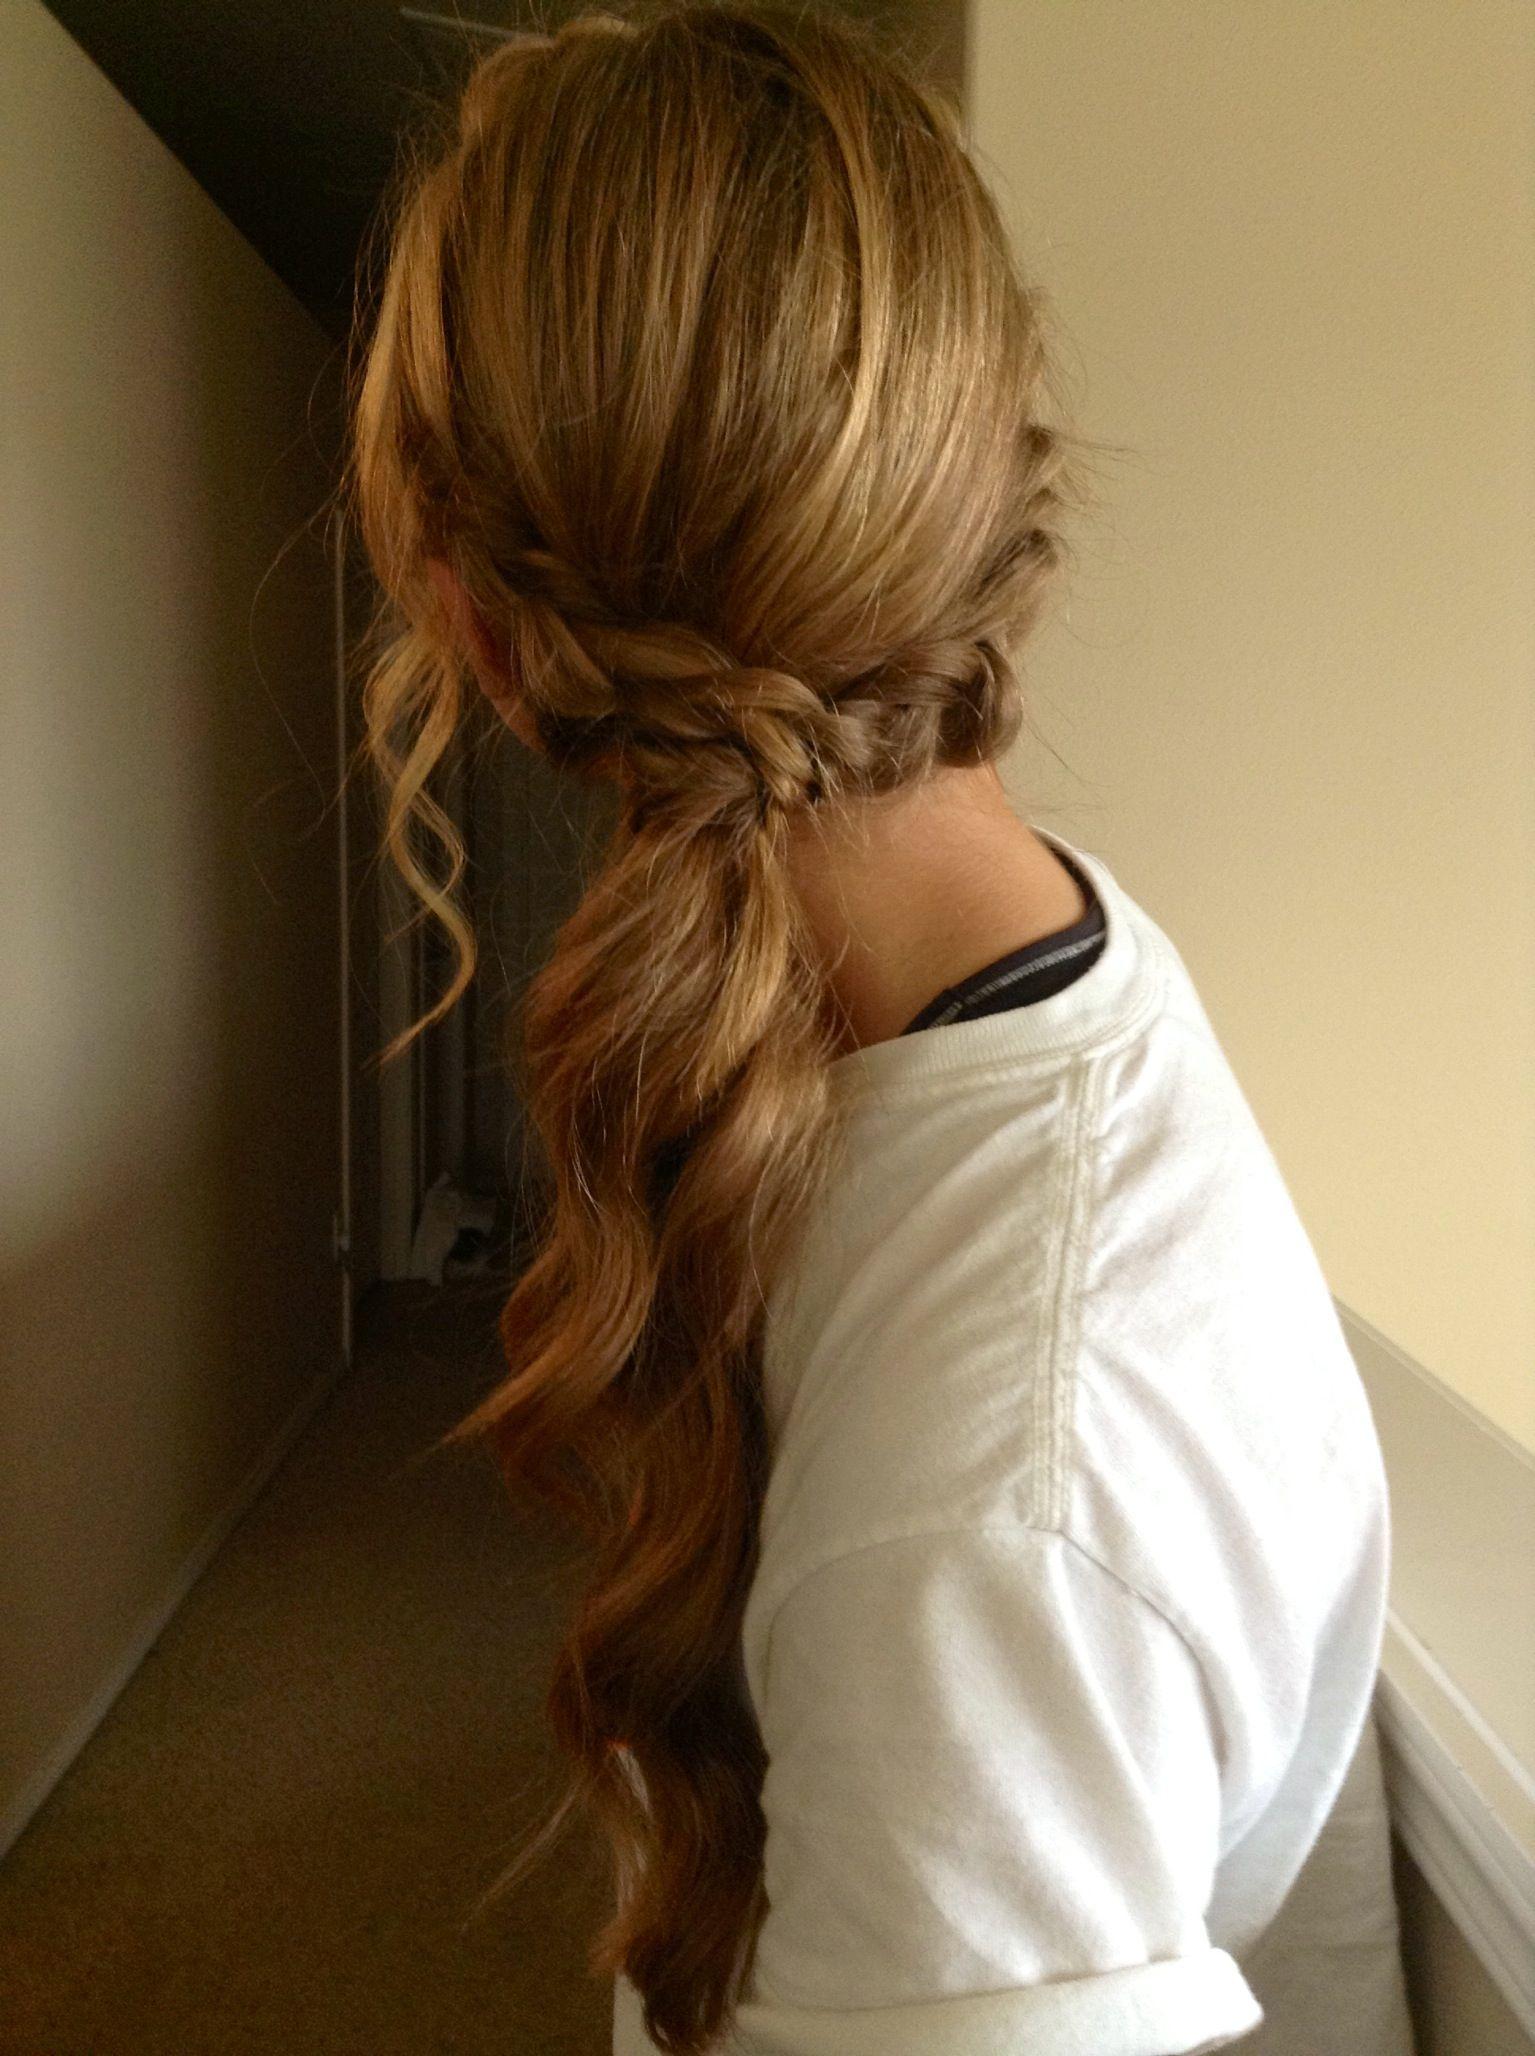 queue-de-cheval : 15 façons de la sophistiquer | hairstyles